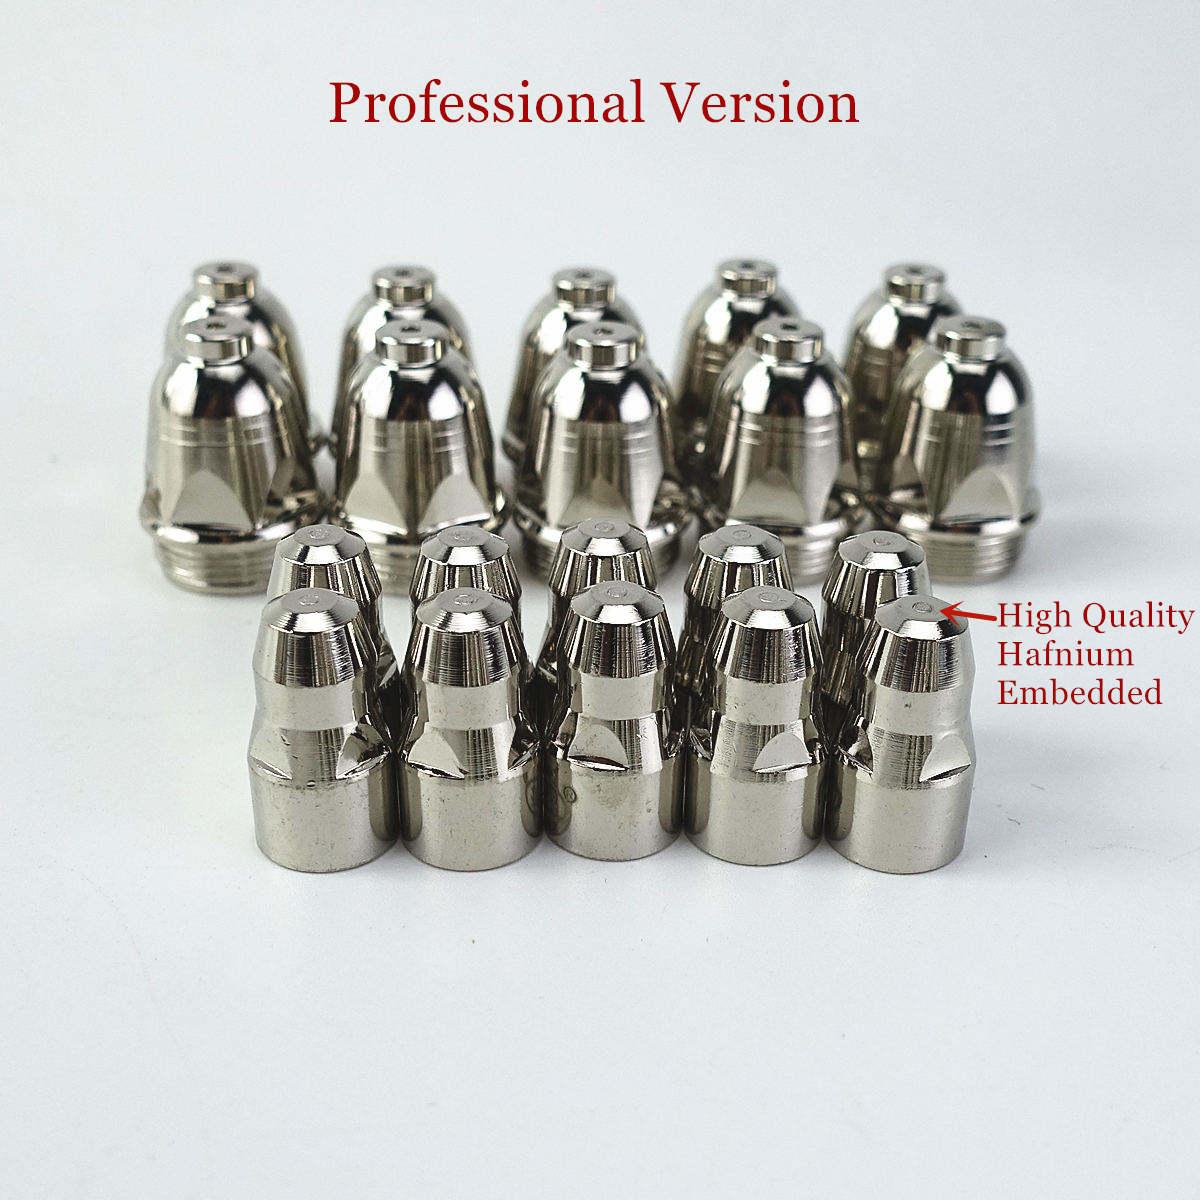 20pcs P80 Plasma Cutting Torch Consumable Cutting 60A 80A 100A P80 CNC Plasma Torch Tip Electrode Nozzle